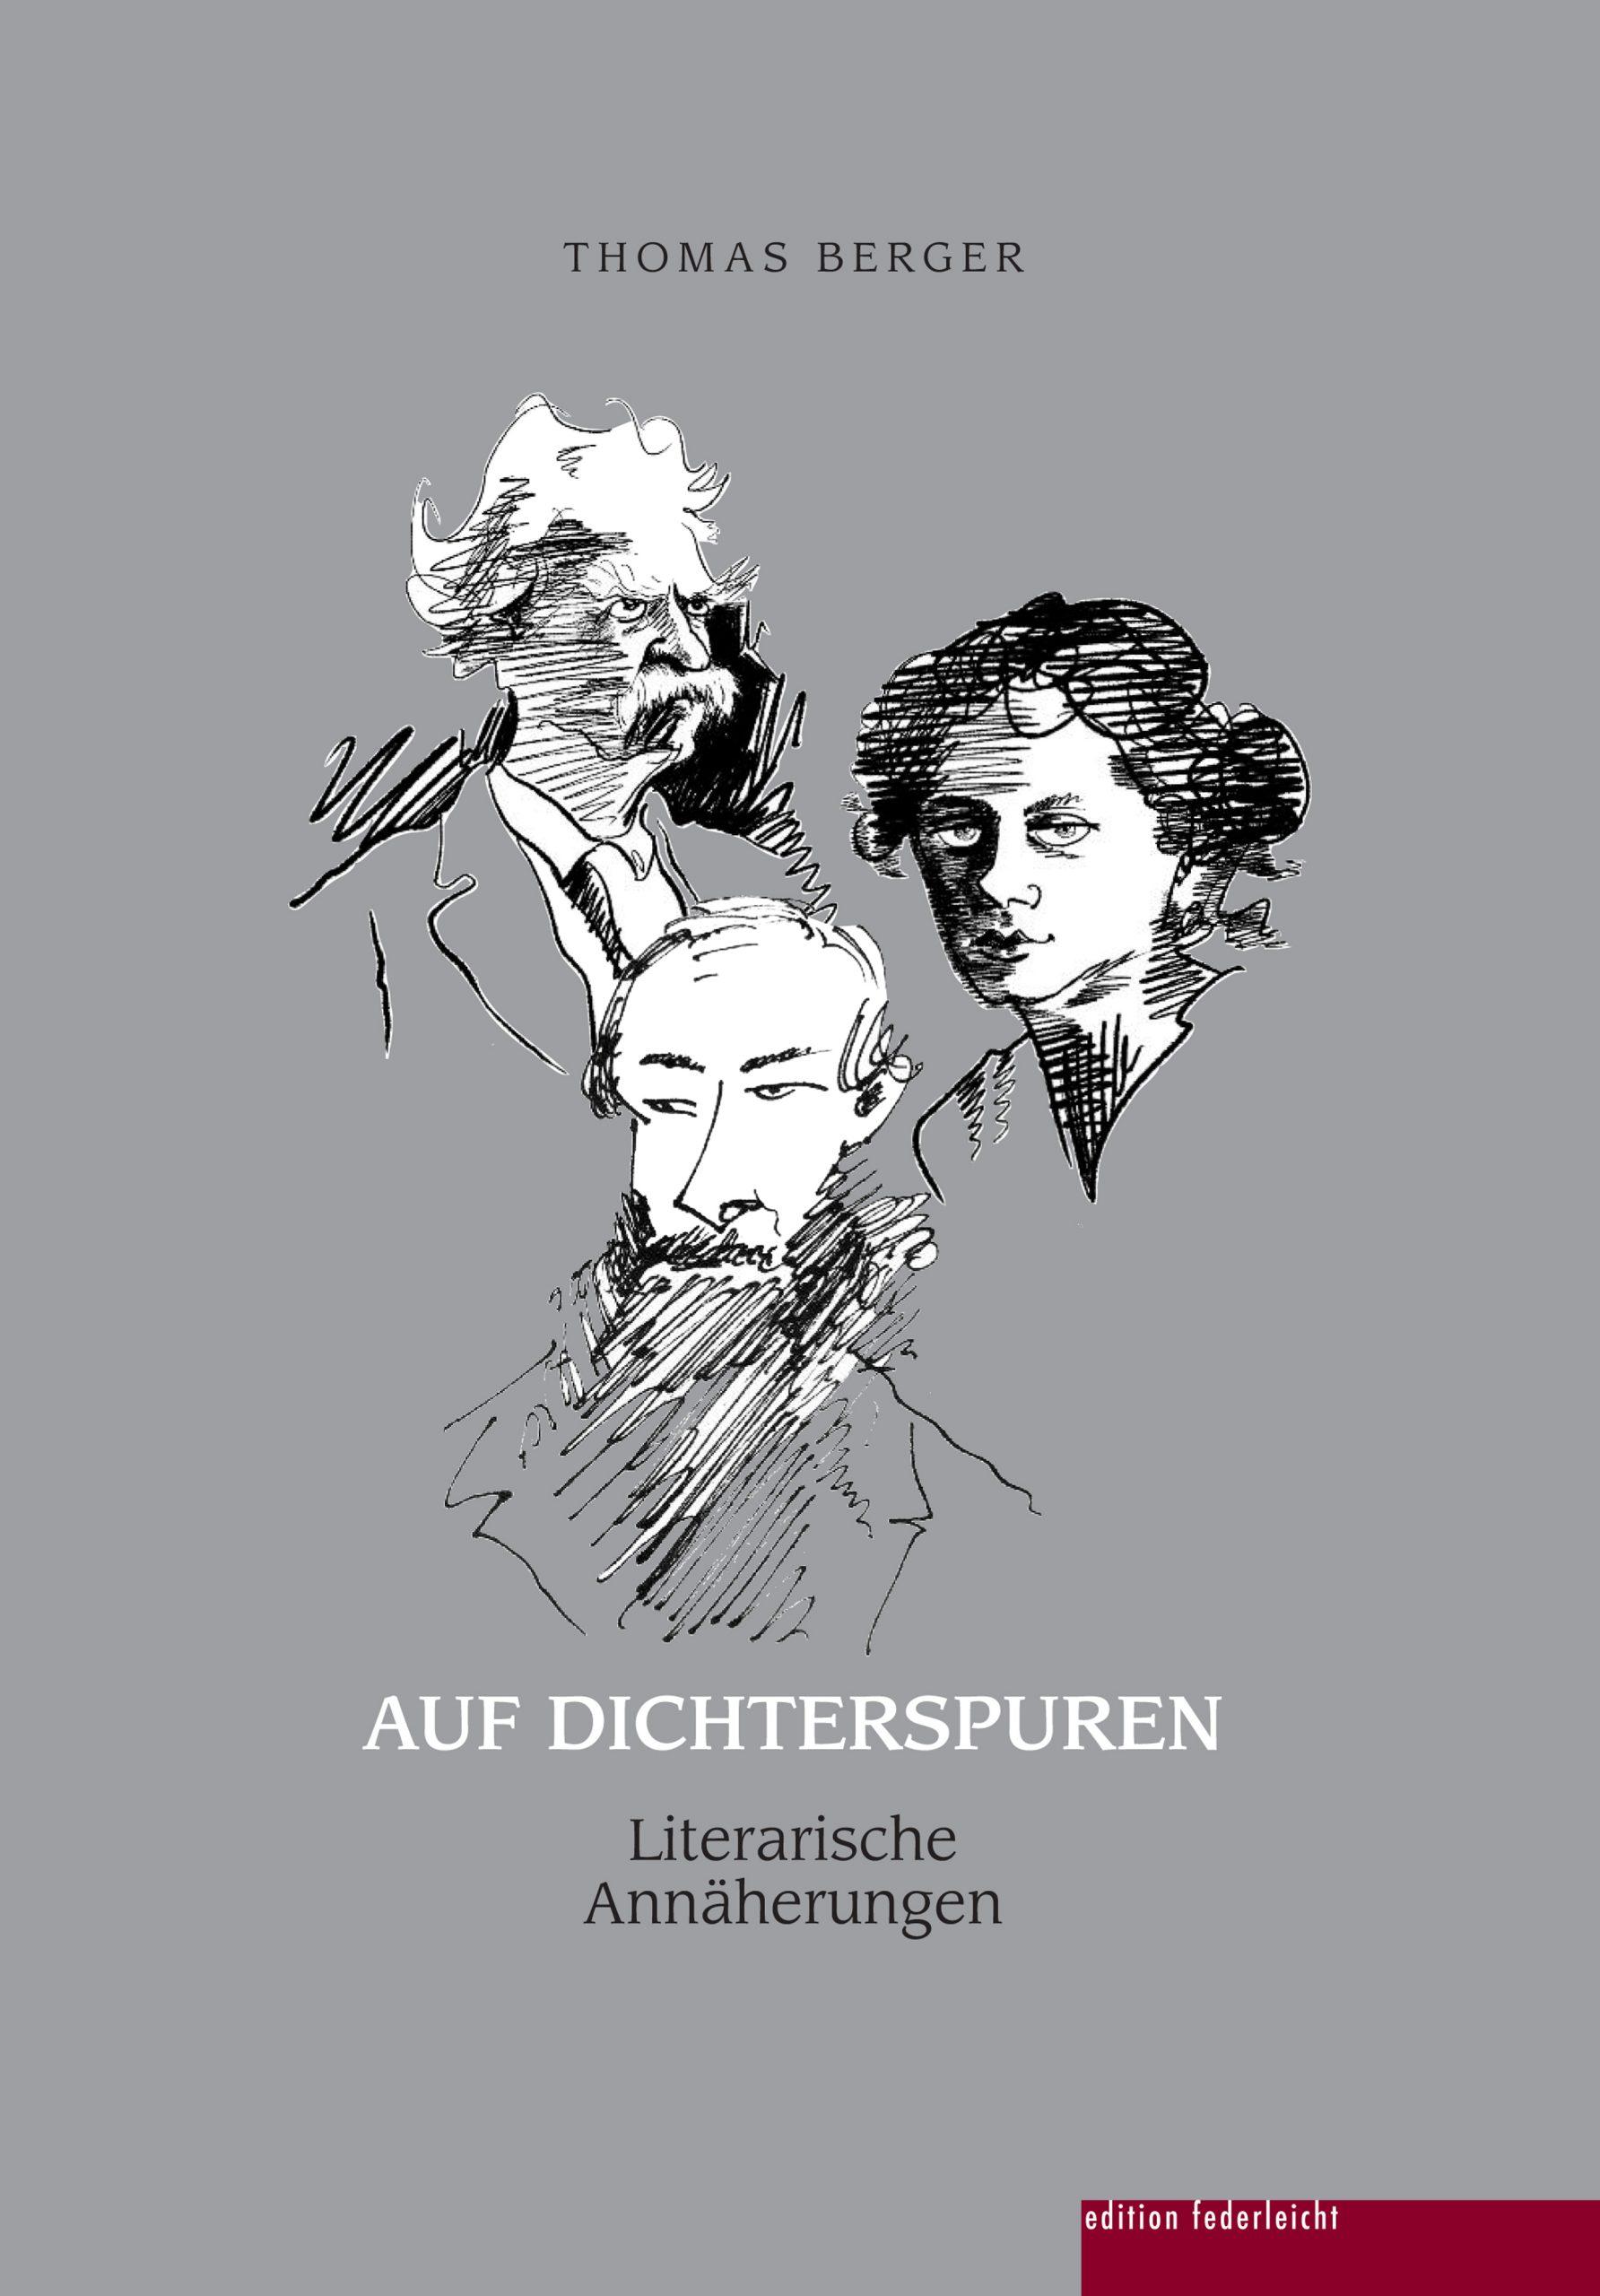 IN APRIL 2021 VERSCHOBEN: Matinee - Lesung mit Susanne Konrad, Thomas Berger, Karina Lotz und Barbara Hennings